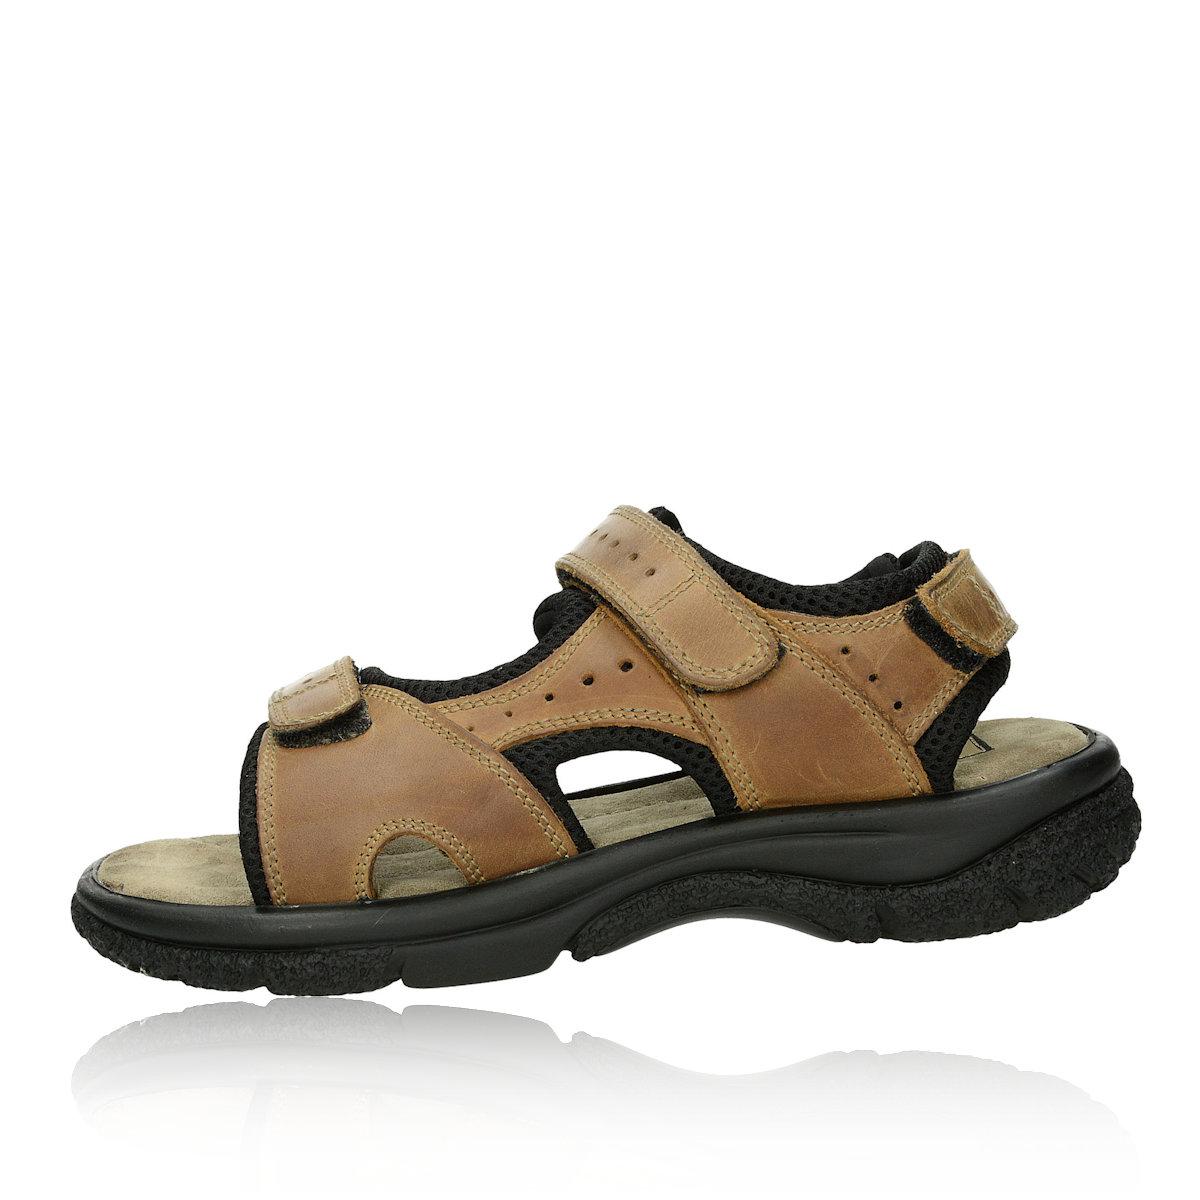 Klondike pánske sandále - hnedé b9bb7d4199f